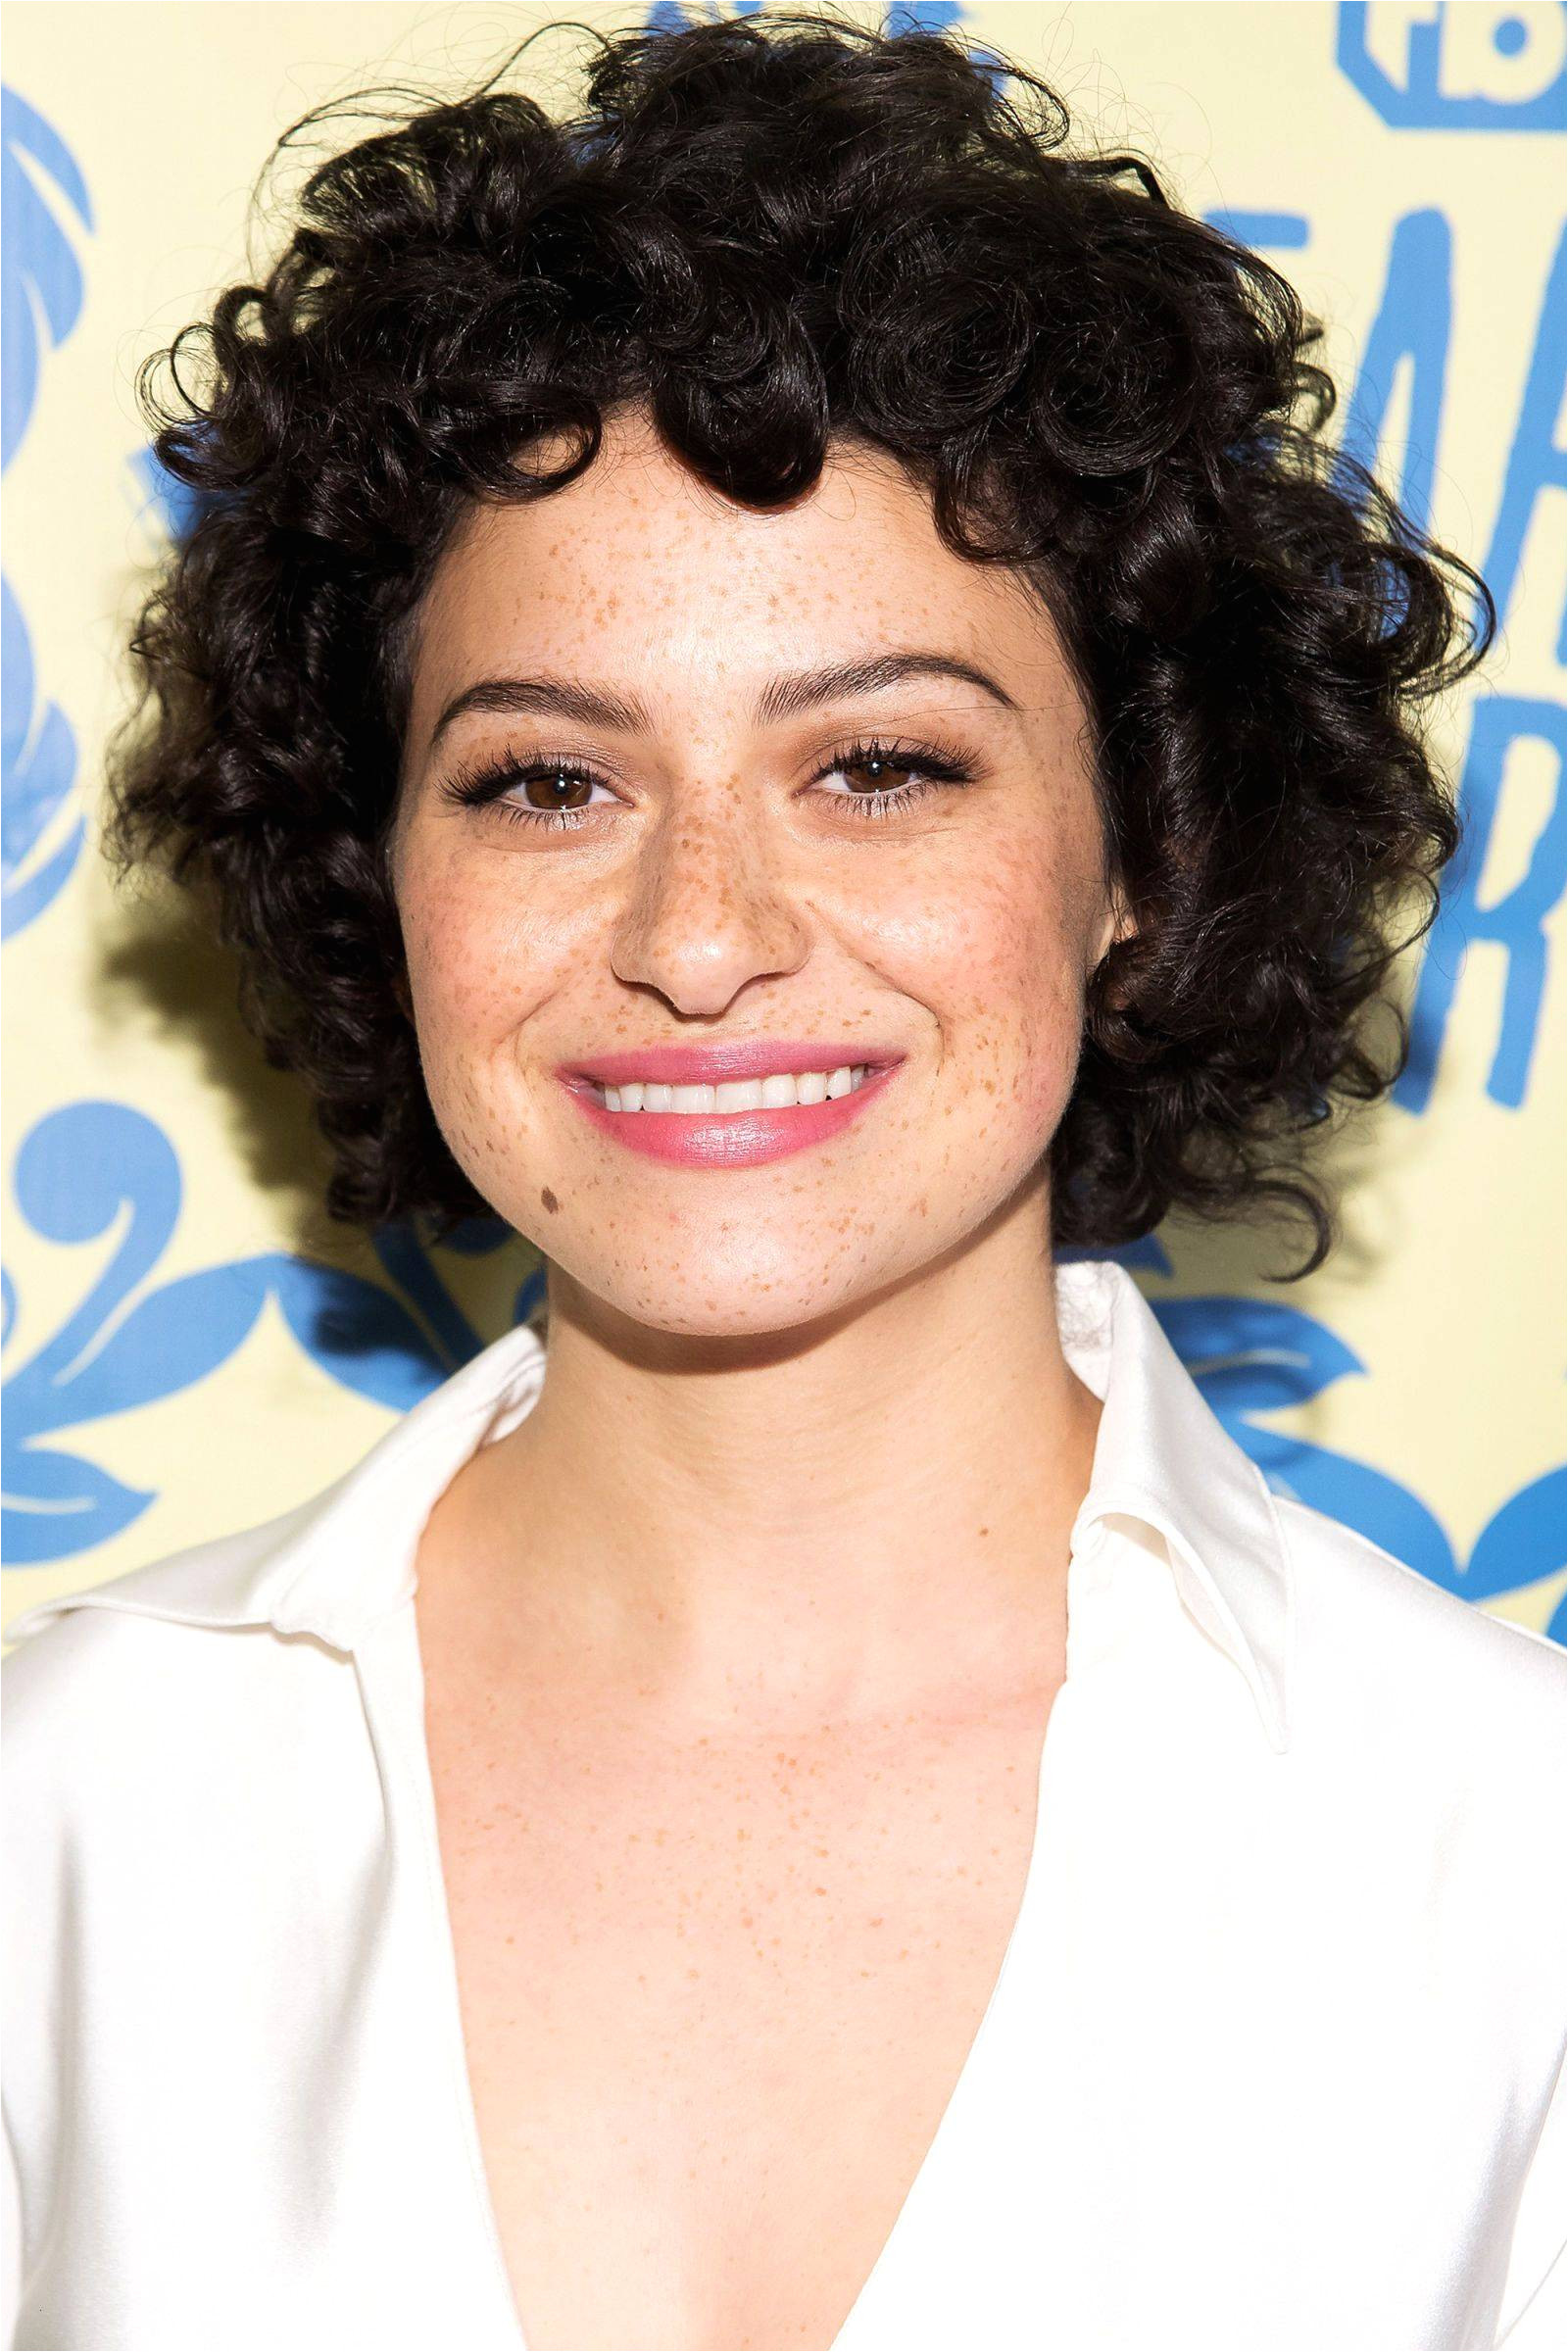 Shoulder Length Wedding Hairstyles Elegant Names Hairstyles New Very Curly Hairstyles Fresh Curly Hair 0d